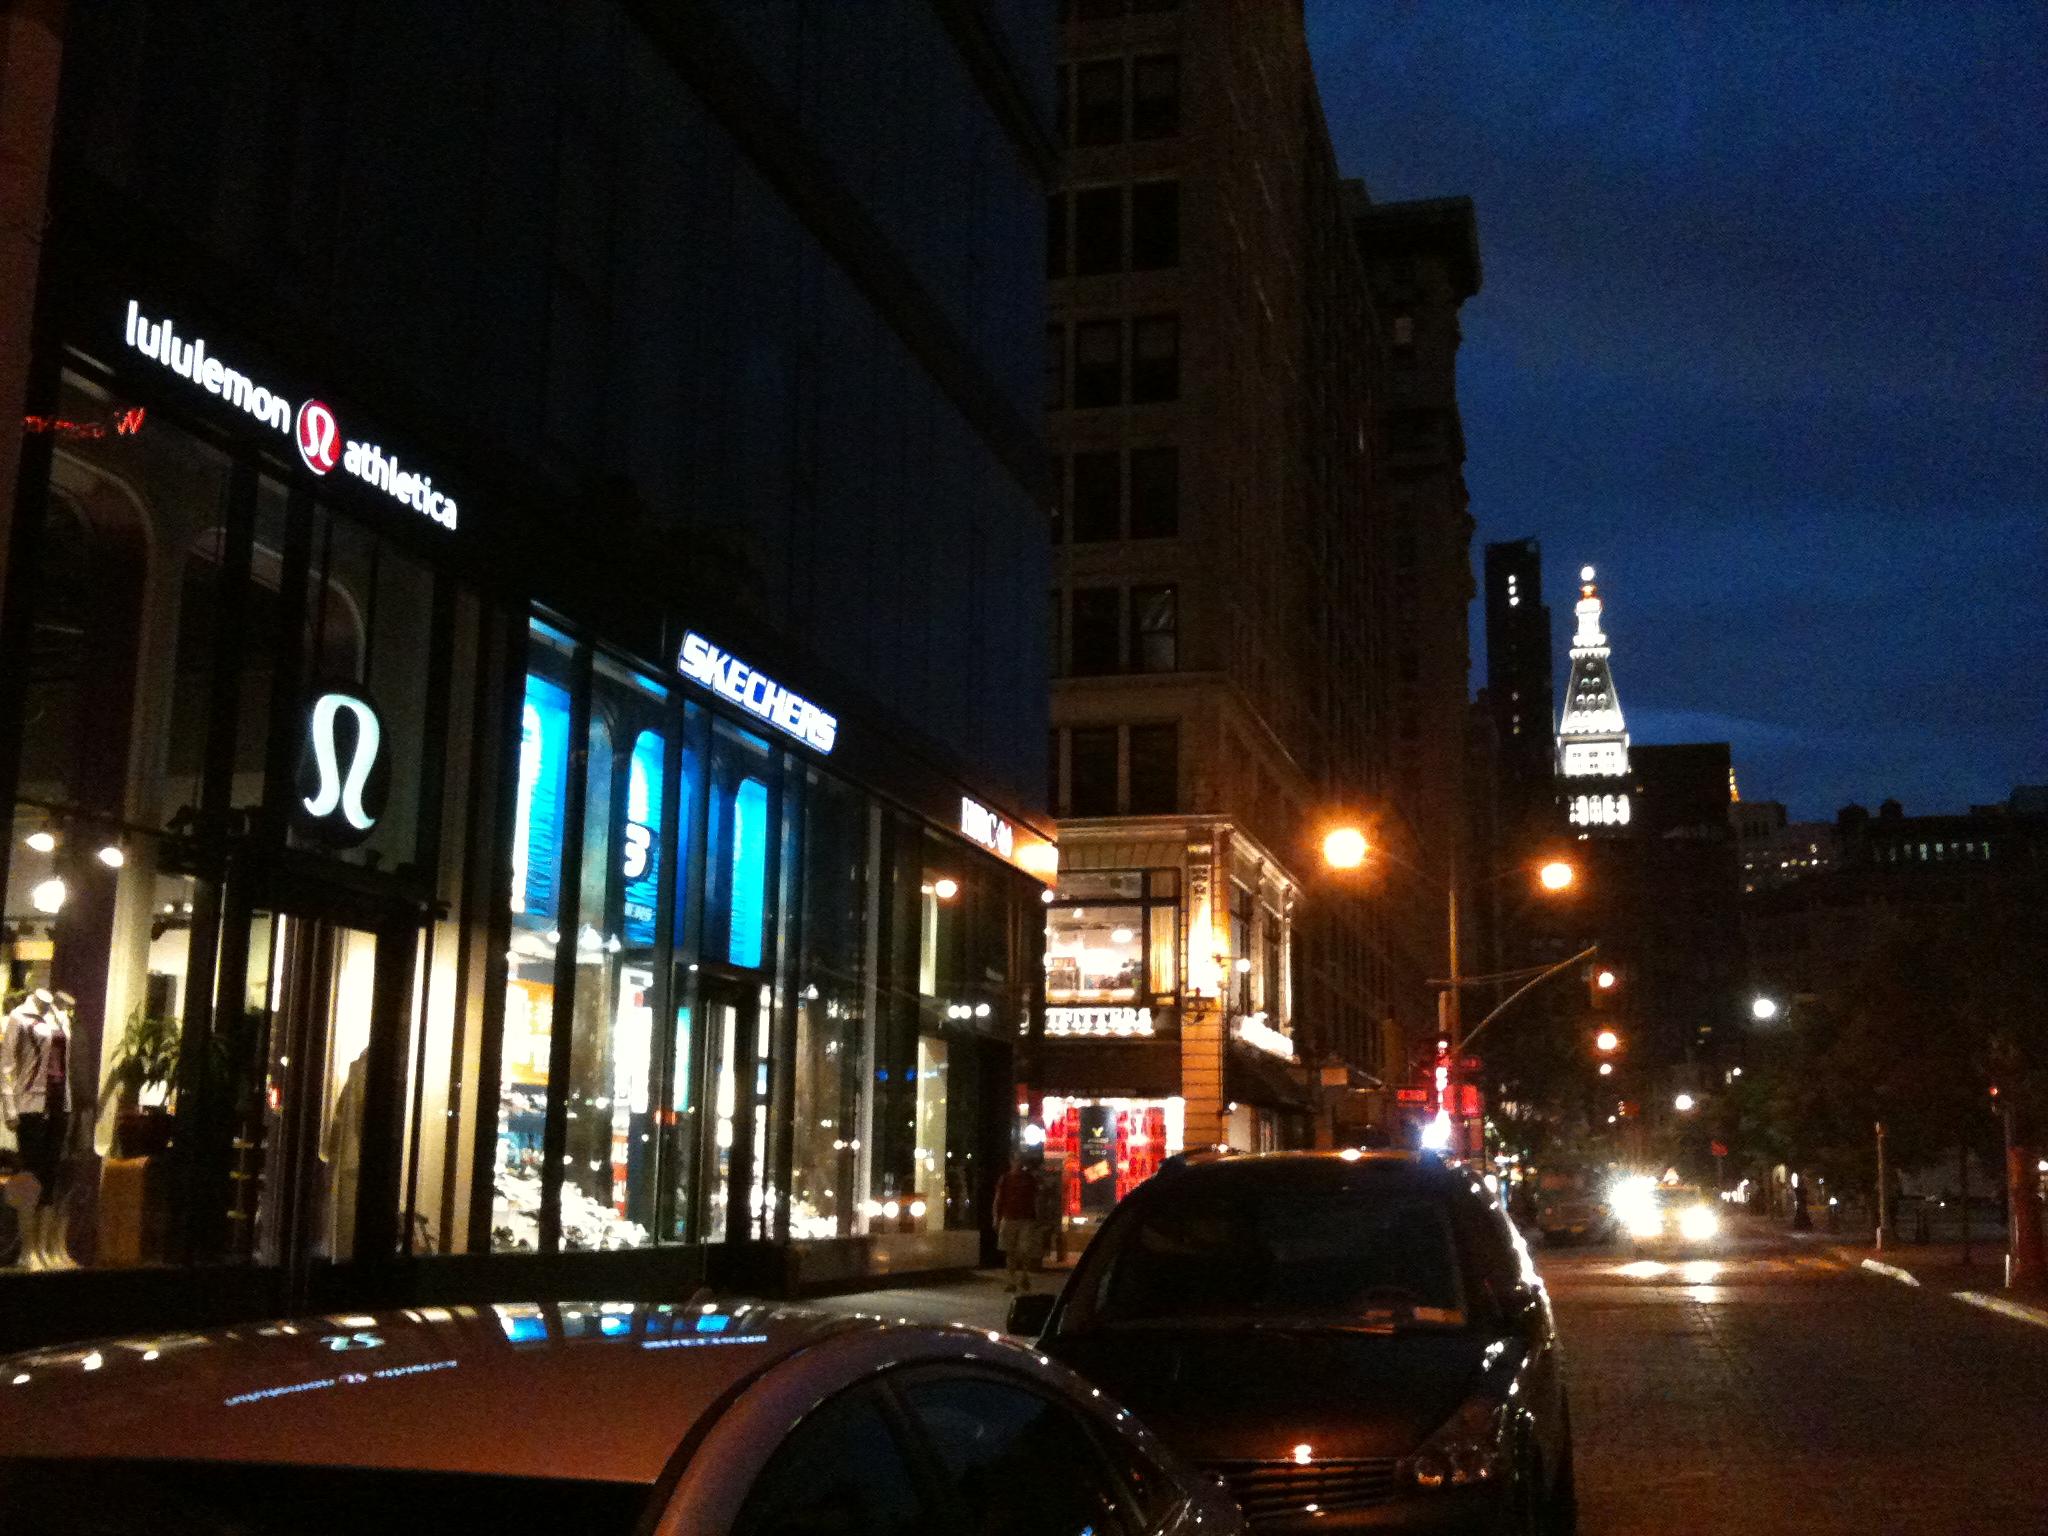 Union Square, NYC, USA  http://www.lululemon.com/newyork/unionsquarenyc